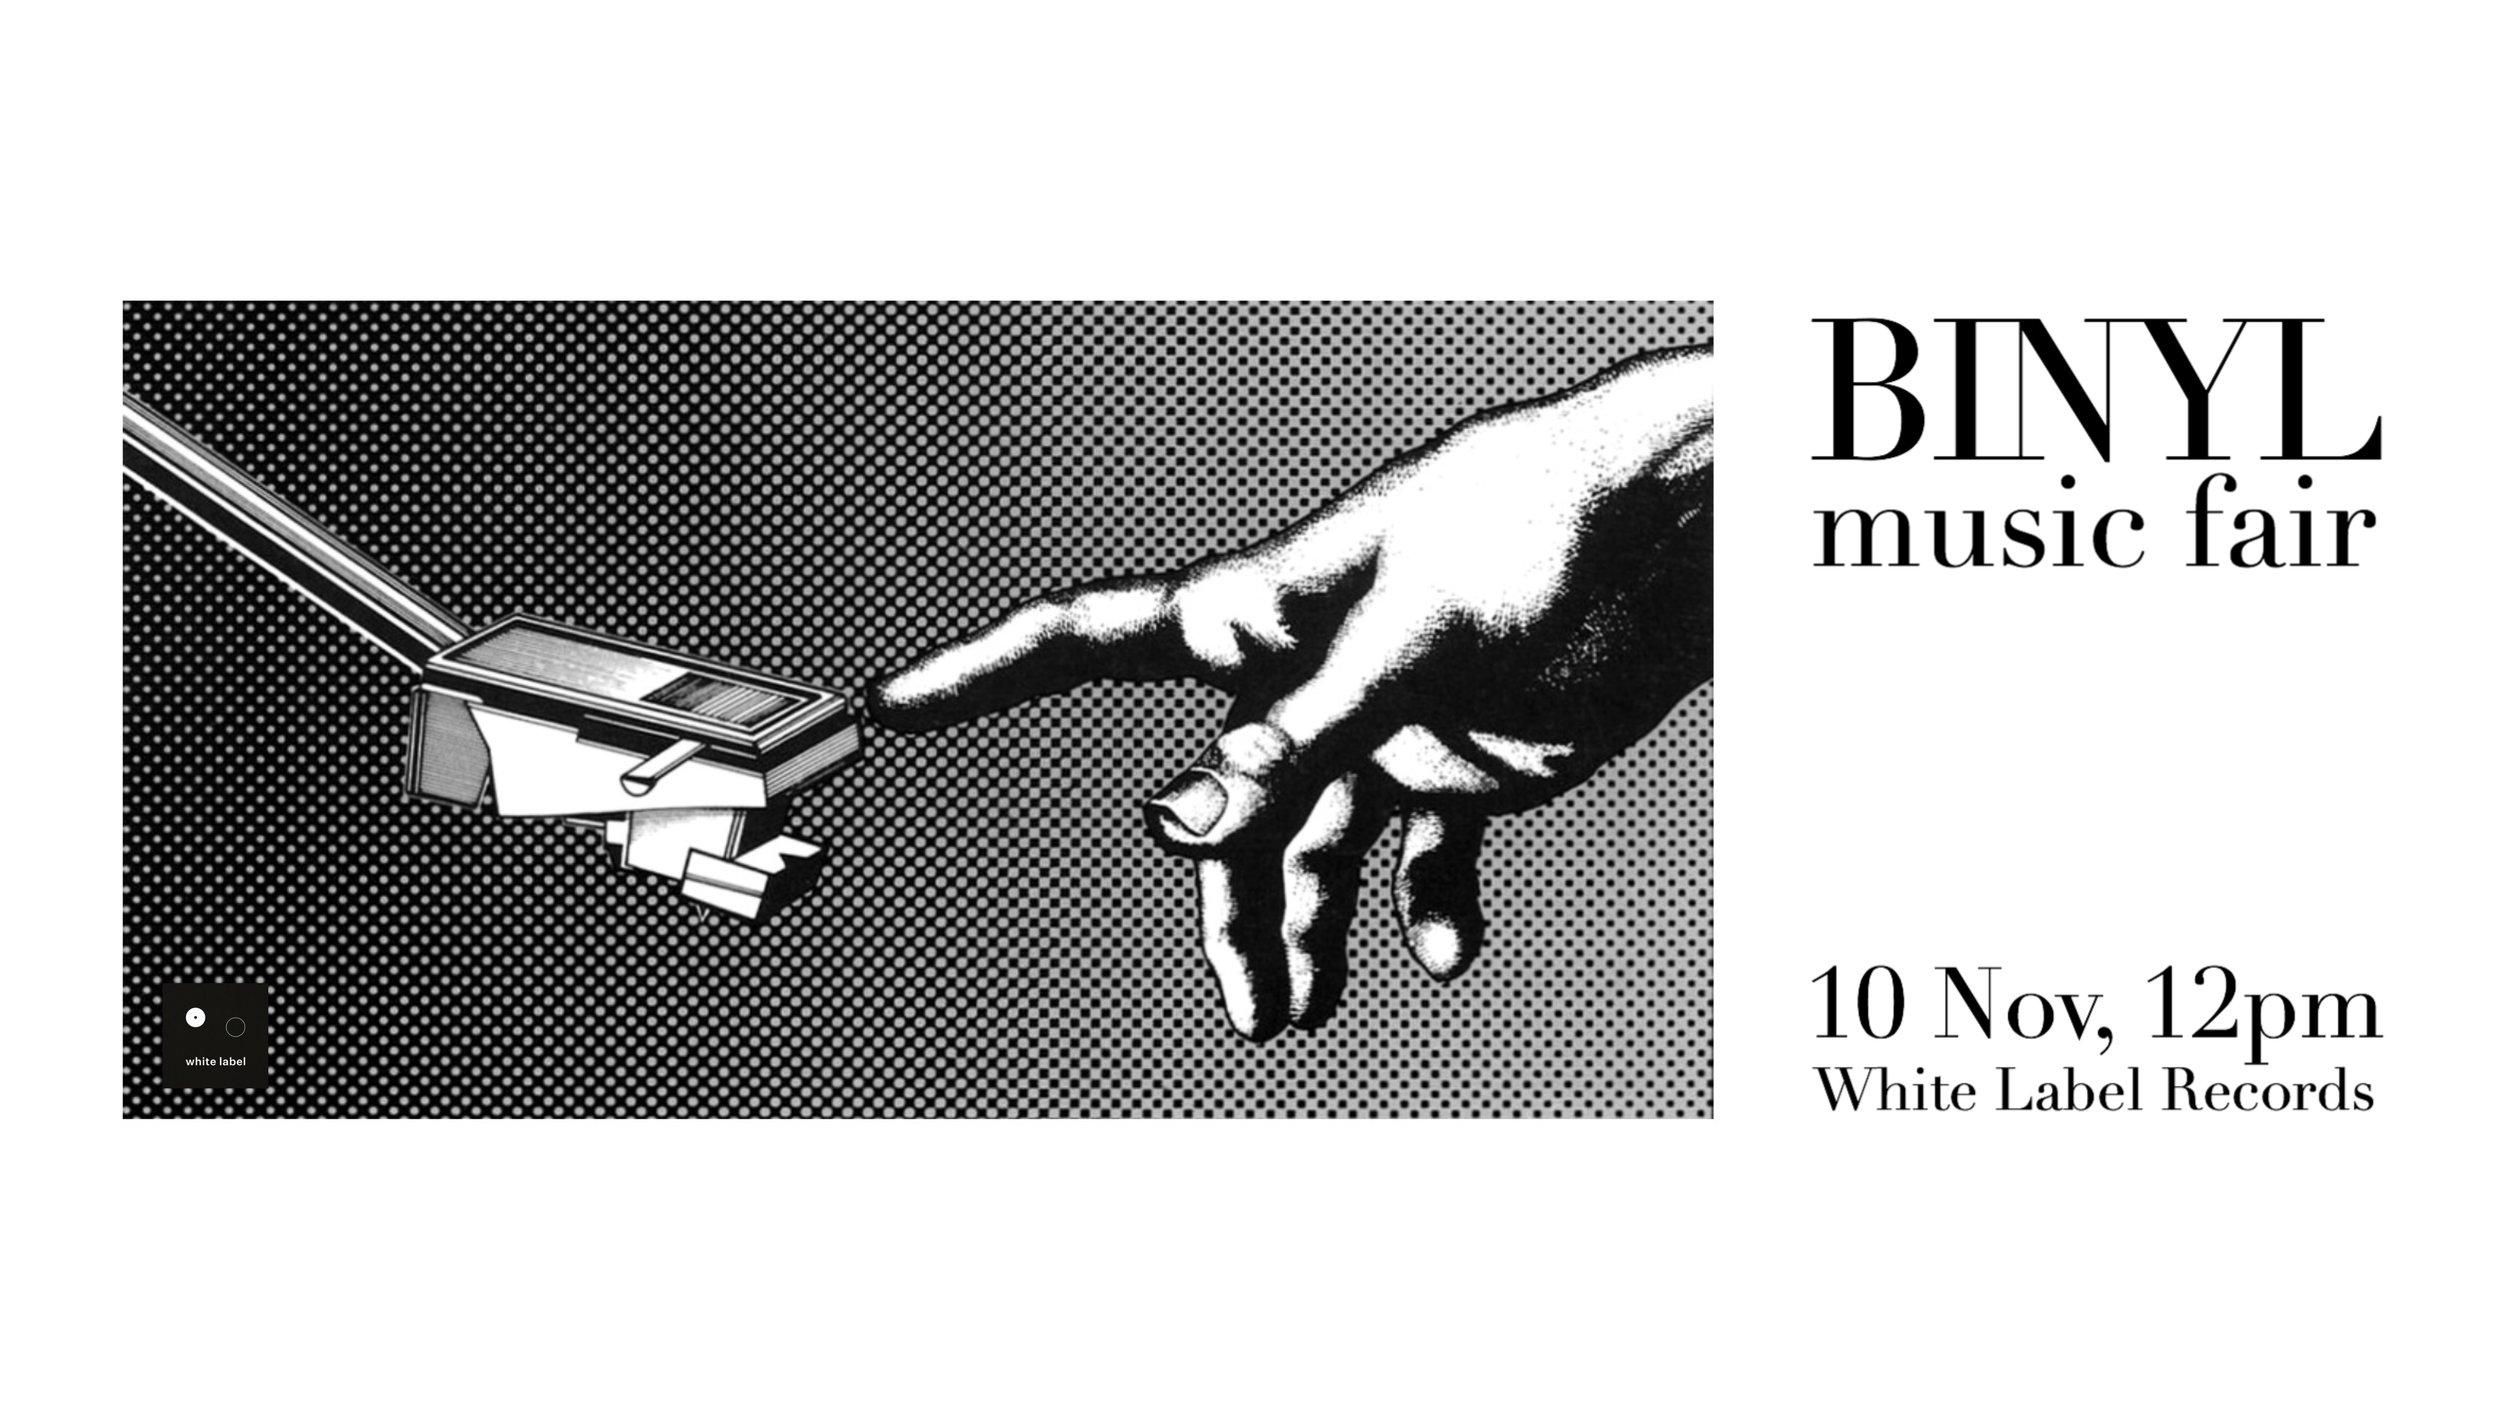 BINYL-Banner_01.JPG